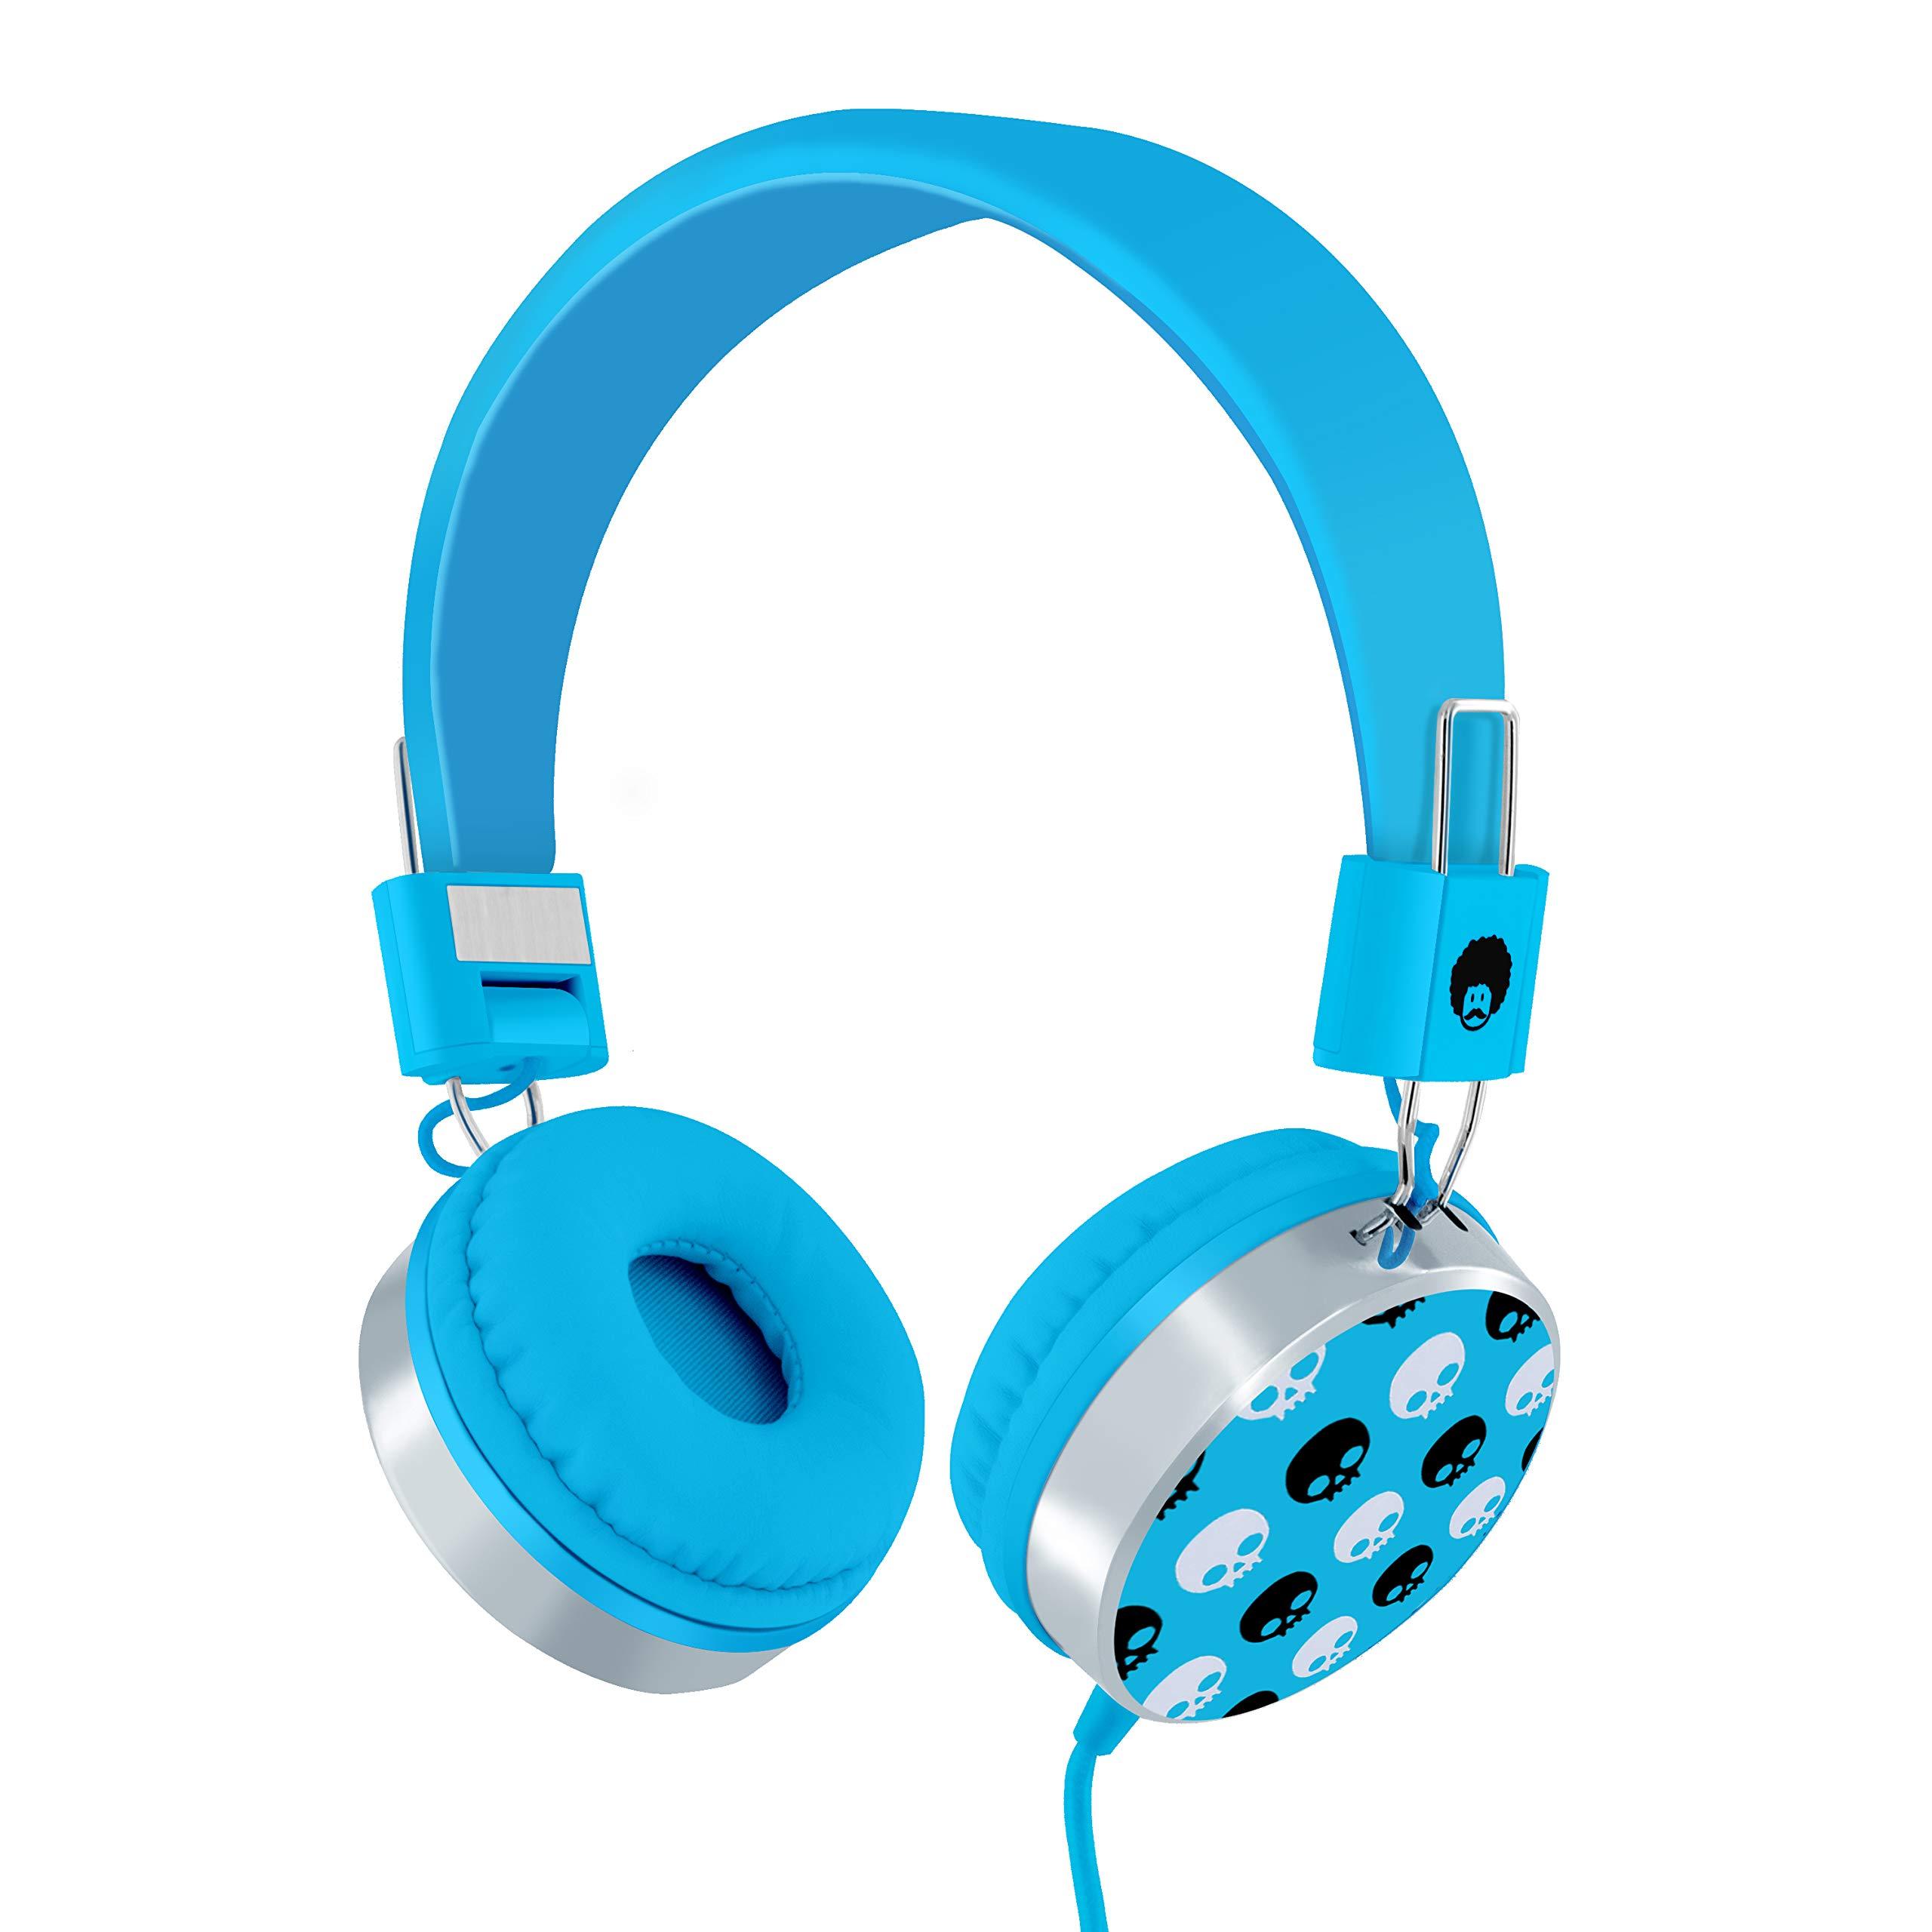 Rockpapa Skull On Ear Wired Headphones Earphones Foldable, Adjustable Headband for Kids Child Toddler Teens Age 3-15, iPod iPad Tablet Laptop Smartphone Mp3 Switch Blue